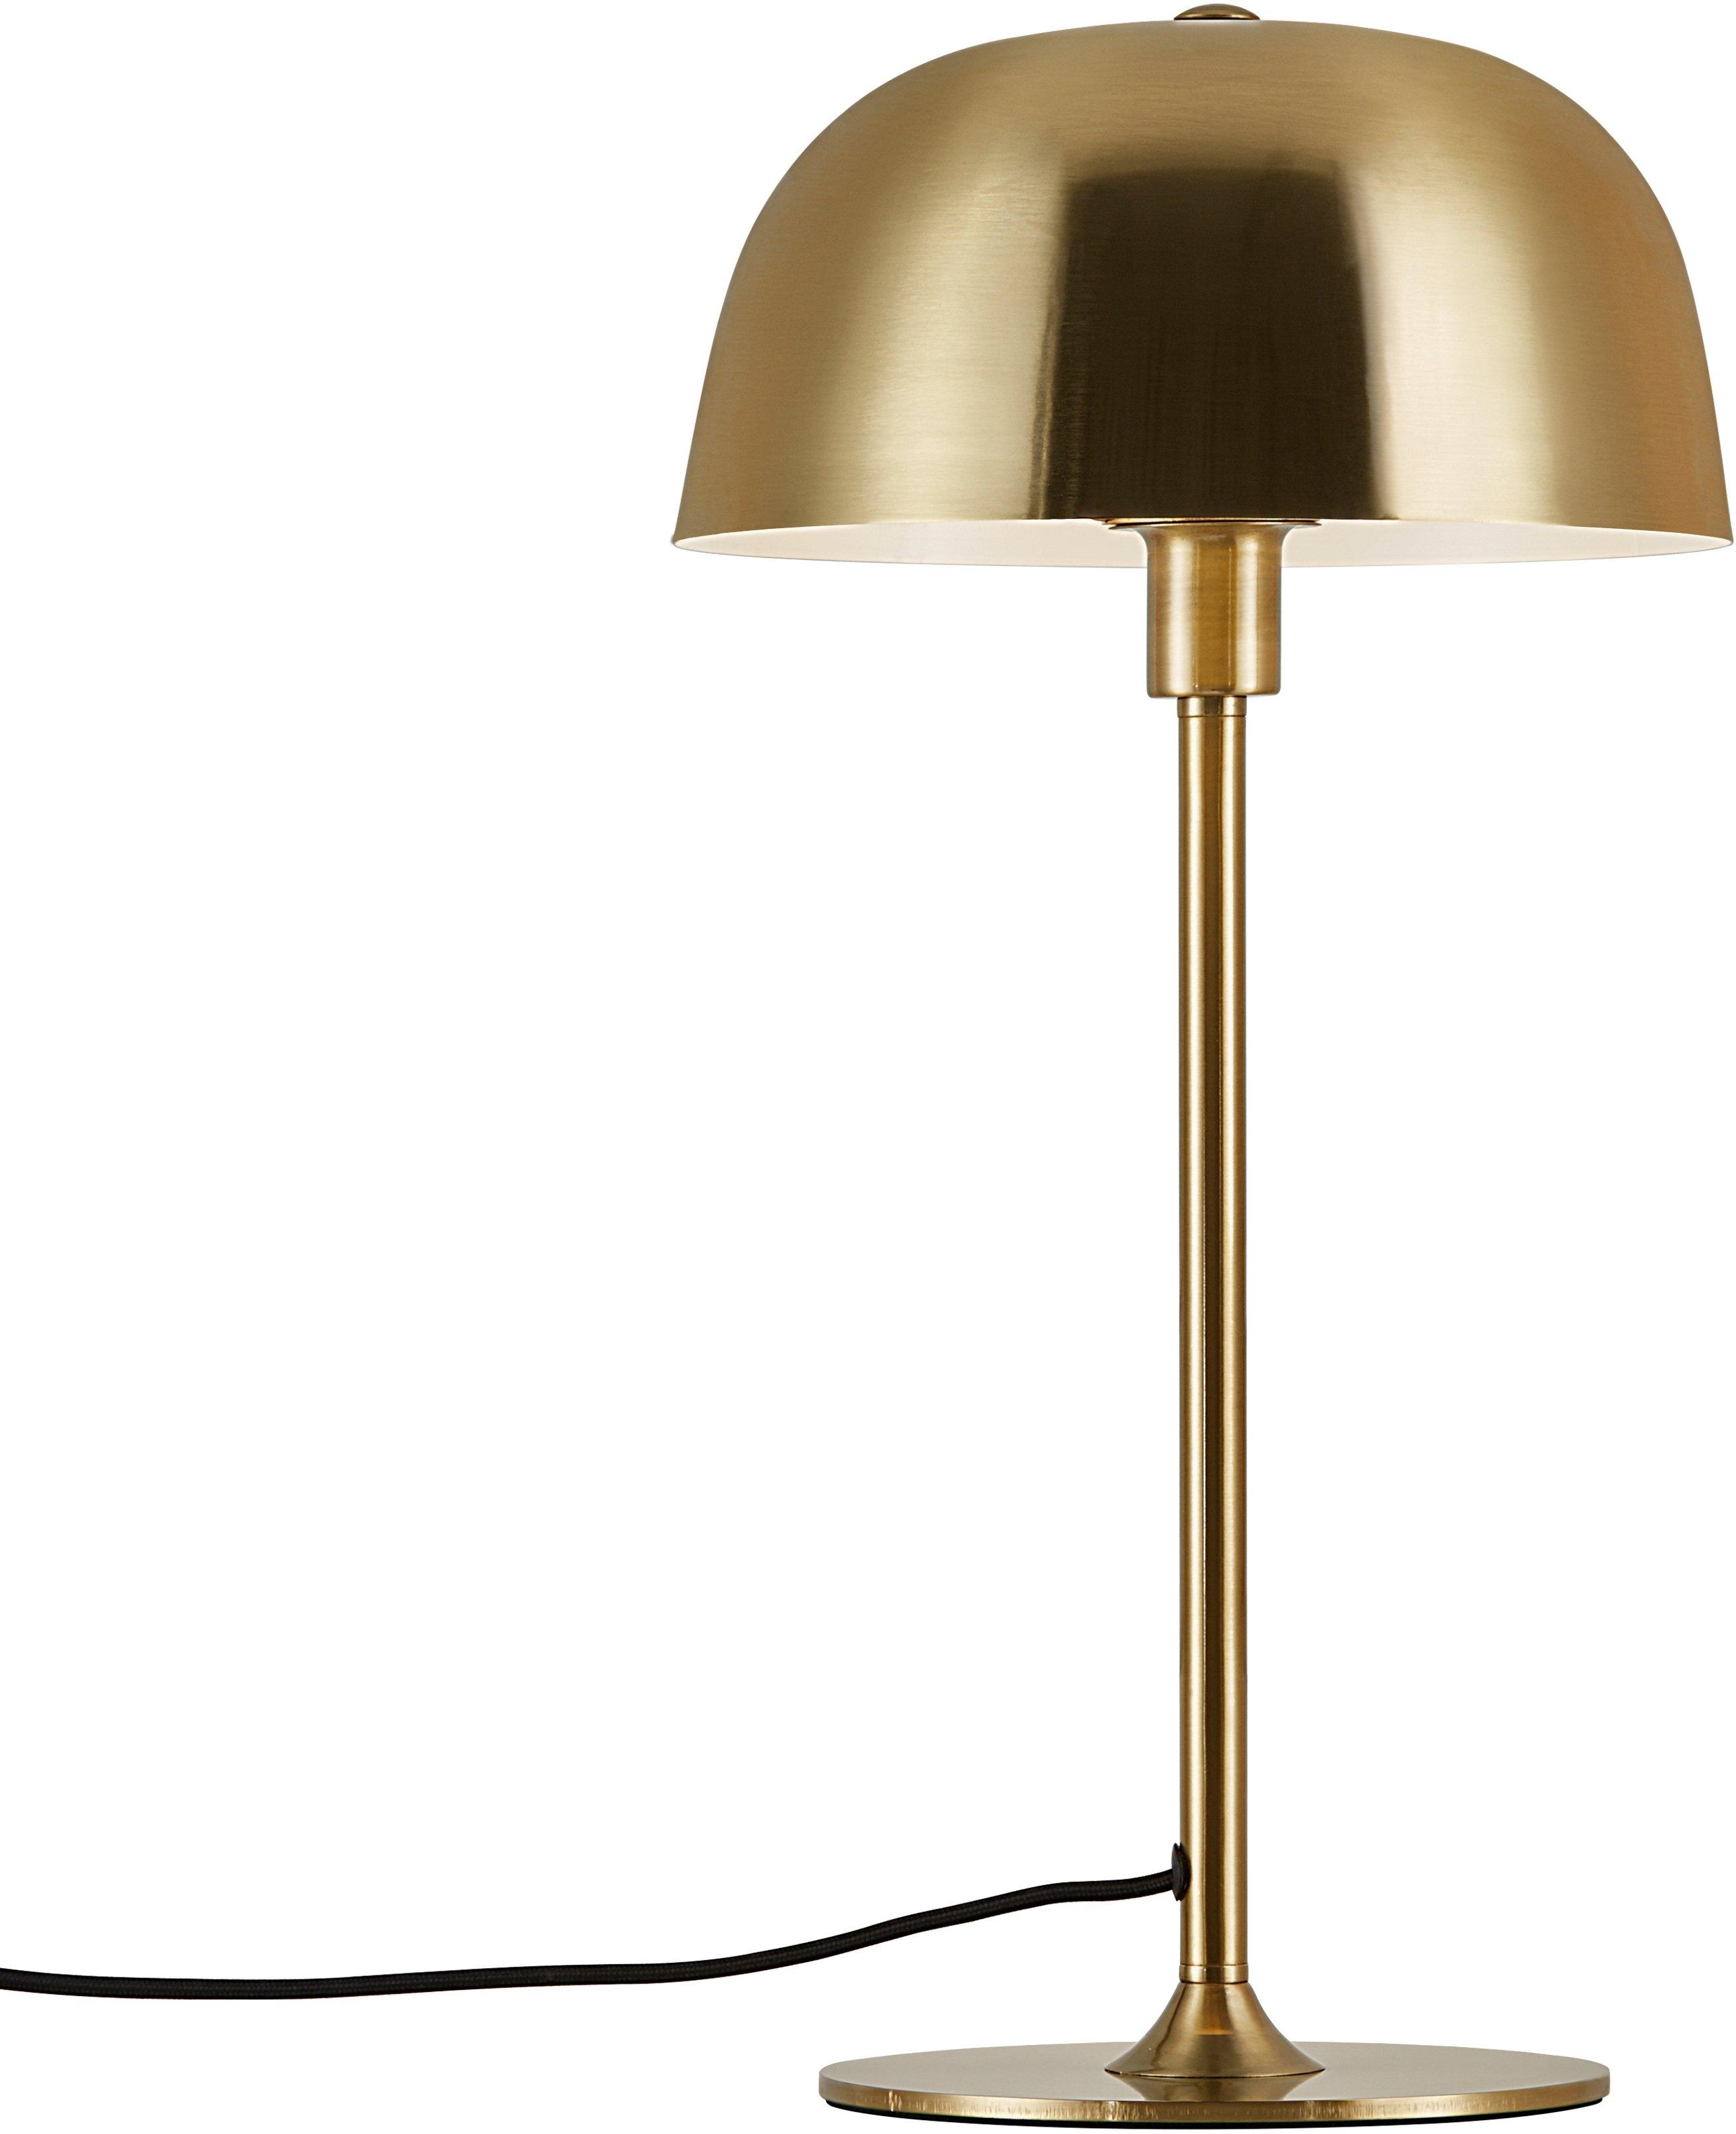 Nordlux tafellamp Cera Messing design, textielsnoer nu online bestellen